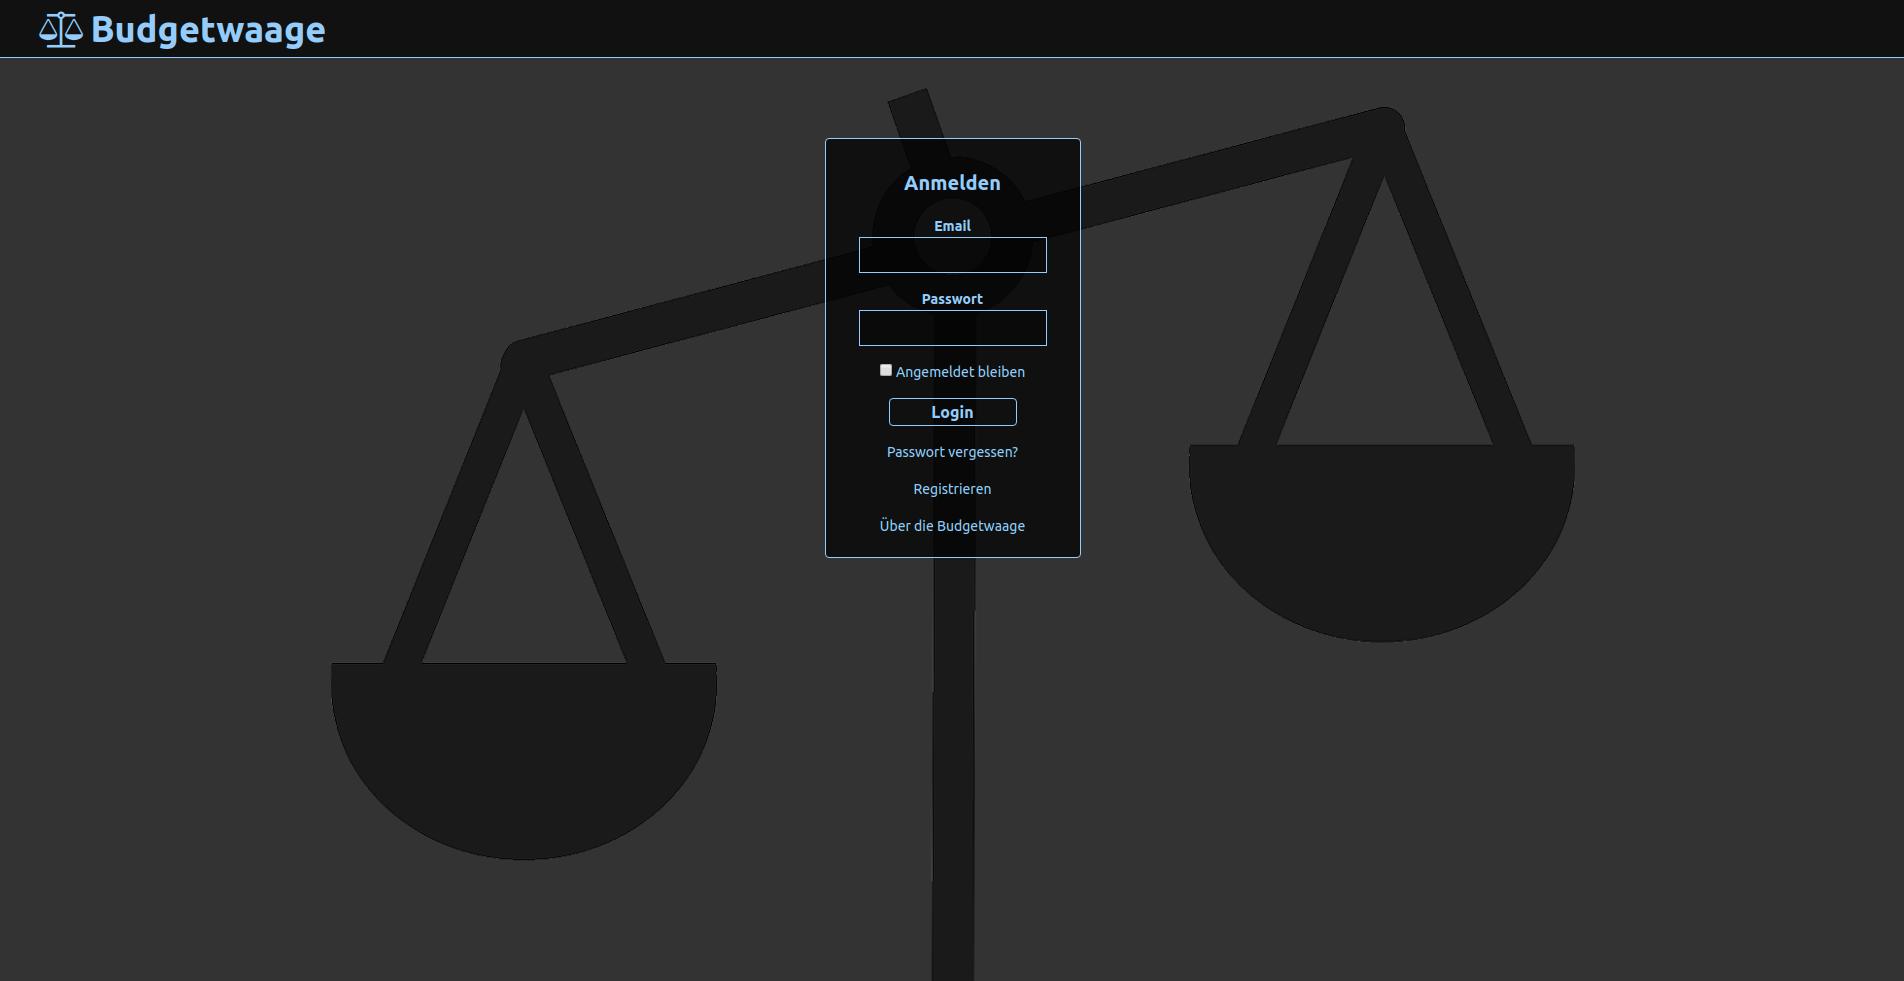 Screenshot Budgetwaage 1